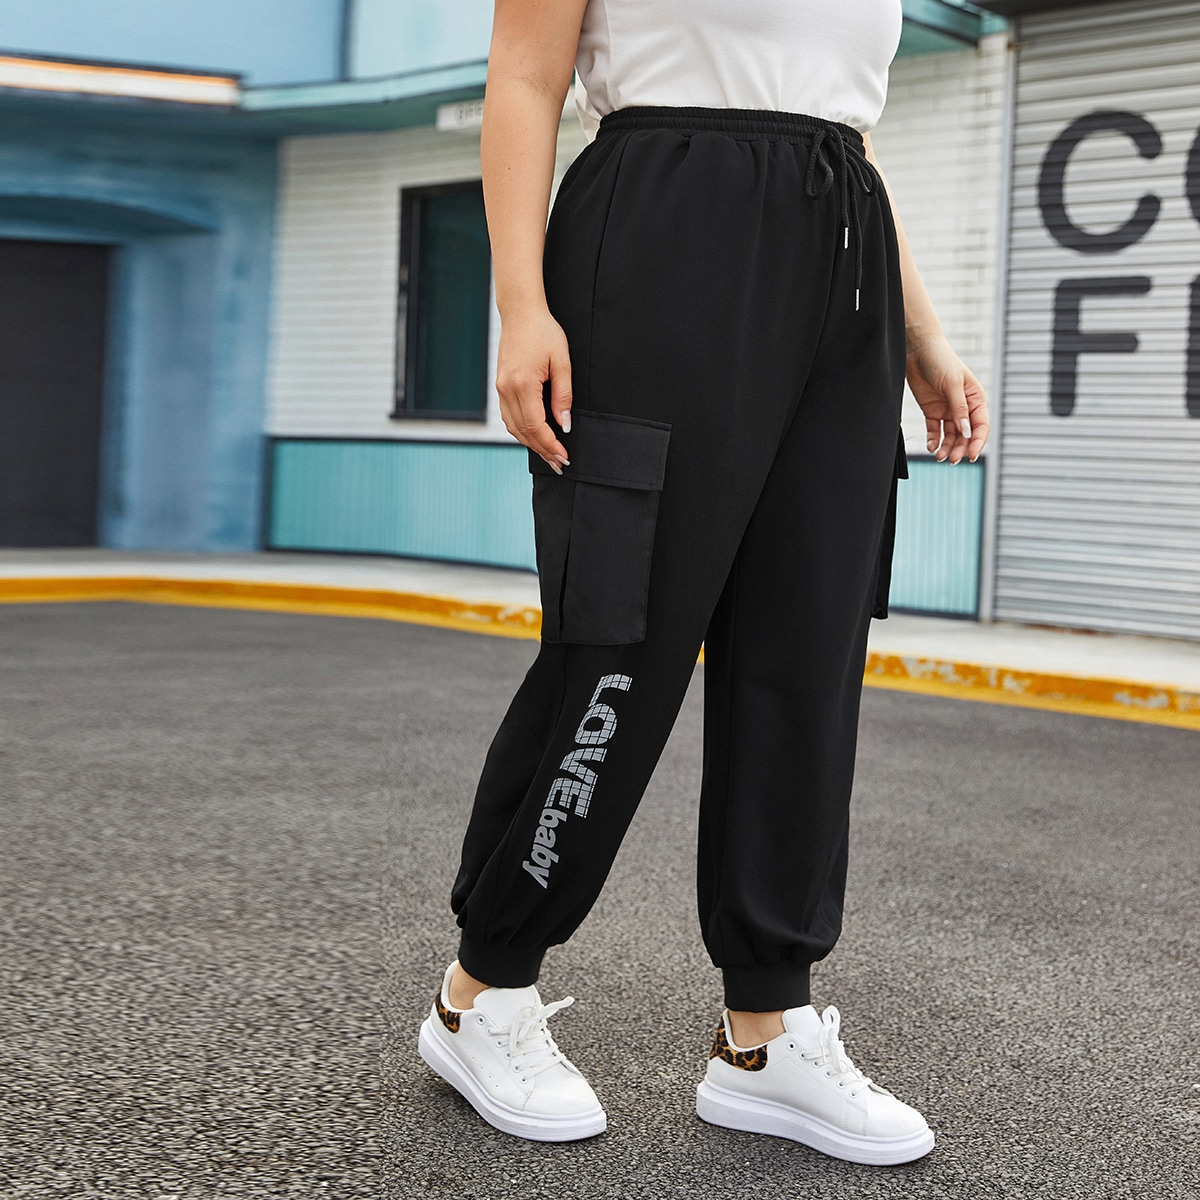 Карман буква спортивный брюки размер плюс